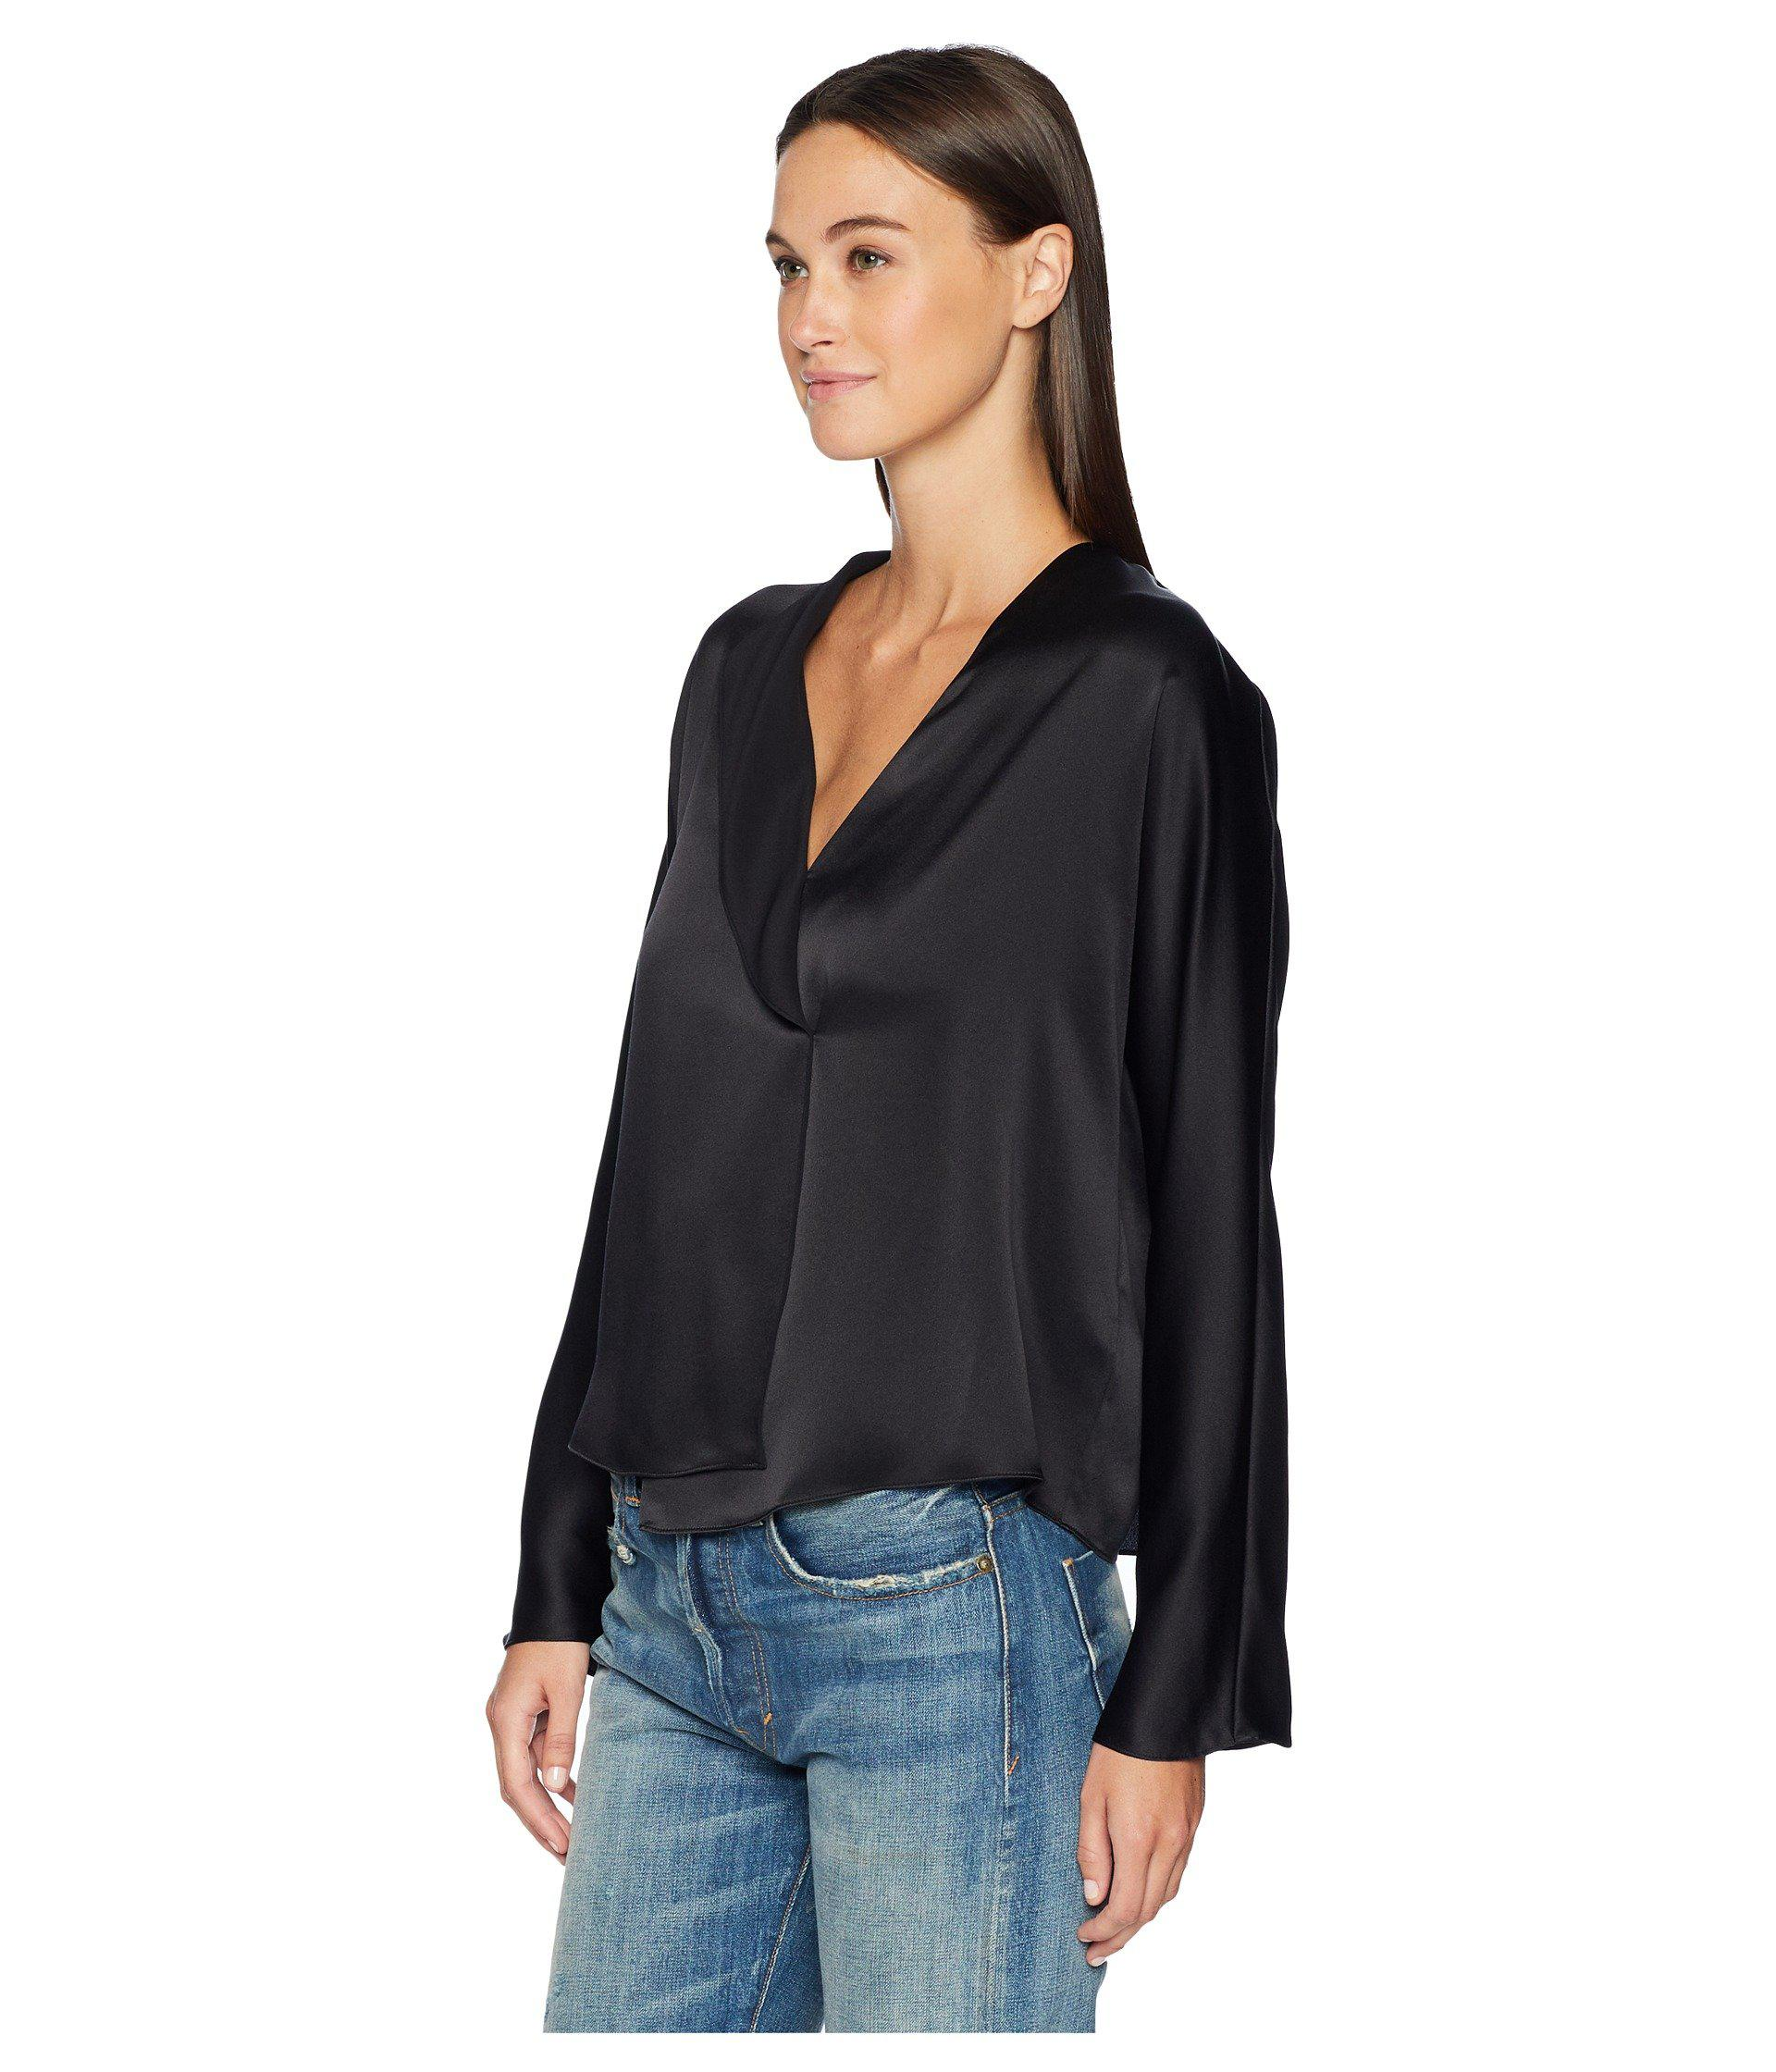 b13adf8a4a02b Lyst - Vince Drape Panel Blouse (black) Women s Clothing in Black